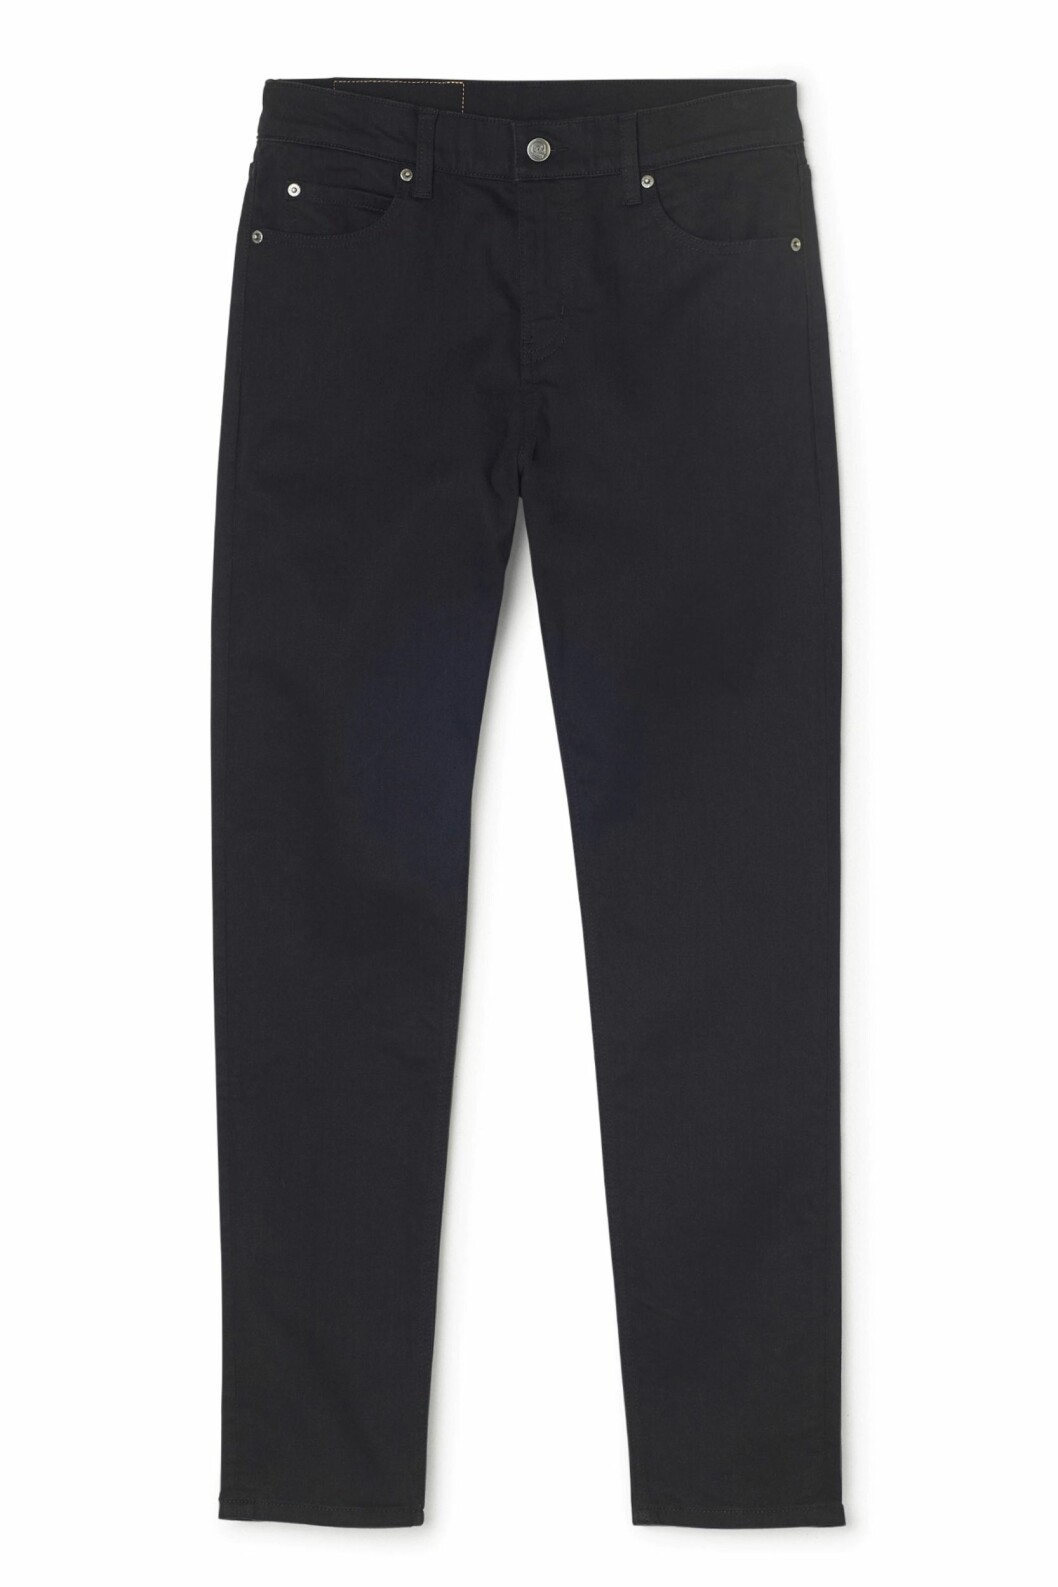 Bukse fra Cheap Monday via Weekday.com | kr 400 | Foto: Produsenten